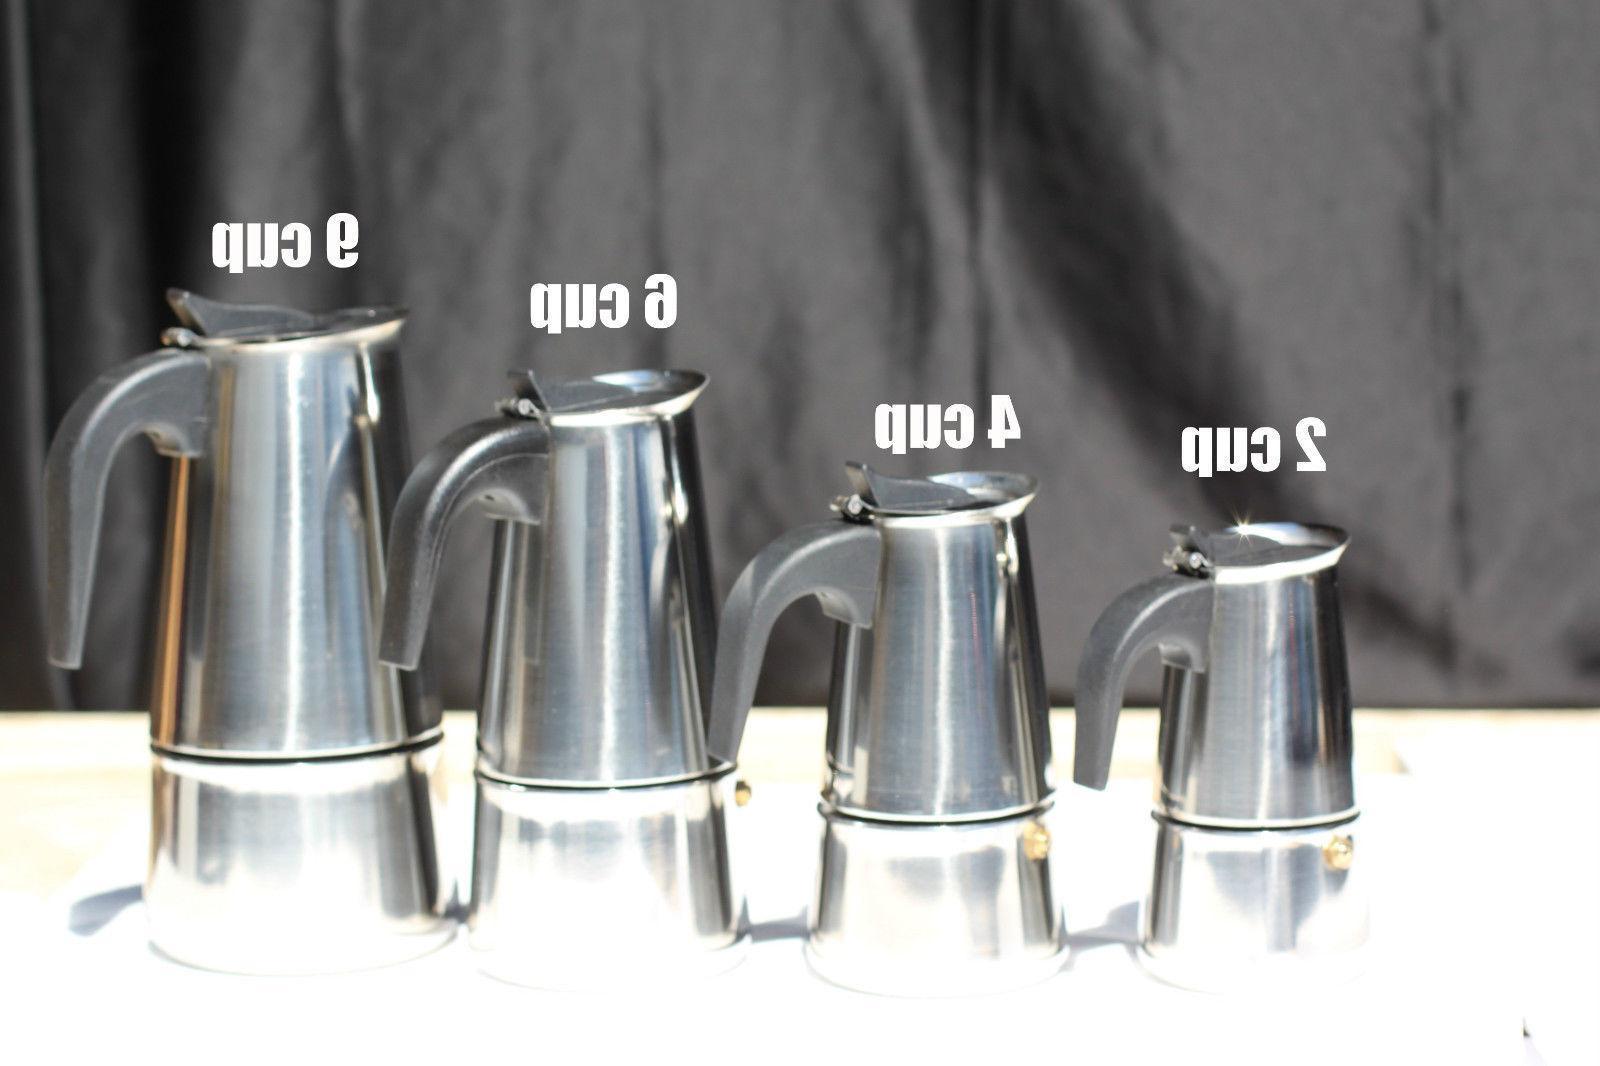 Stainless Steel Moka Stovetop 2/4/6/9